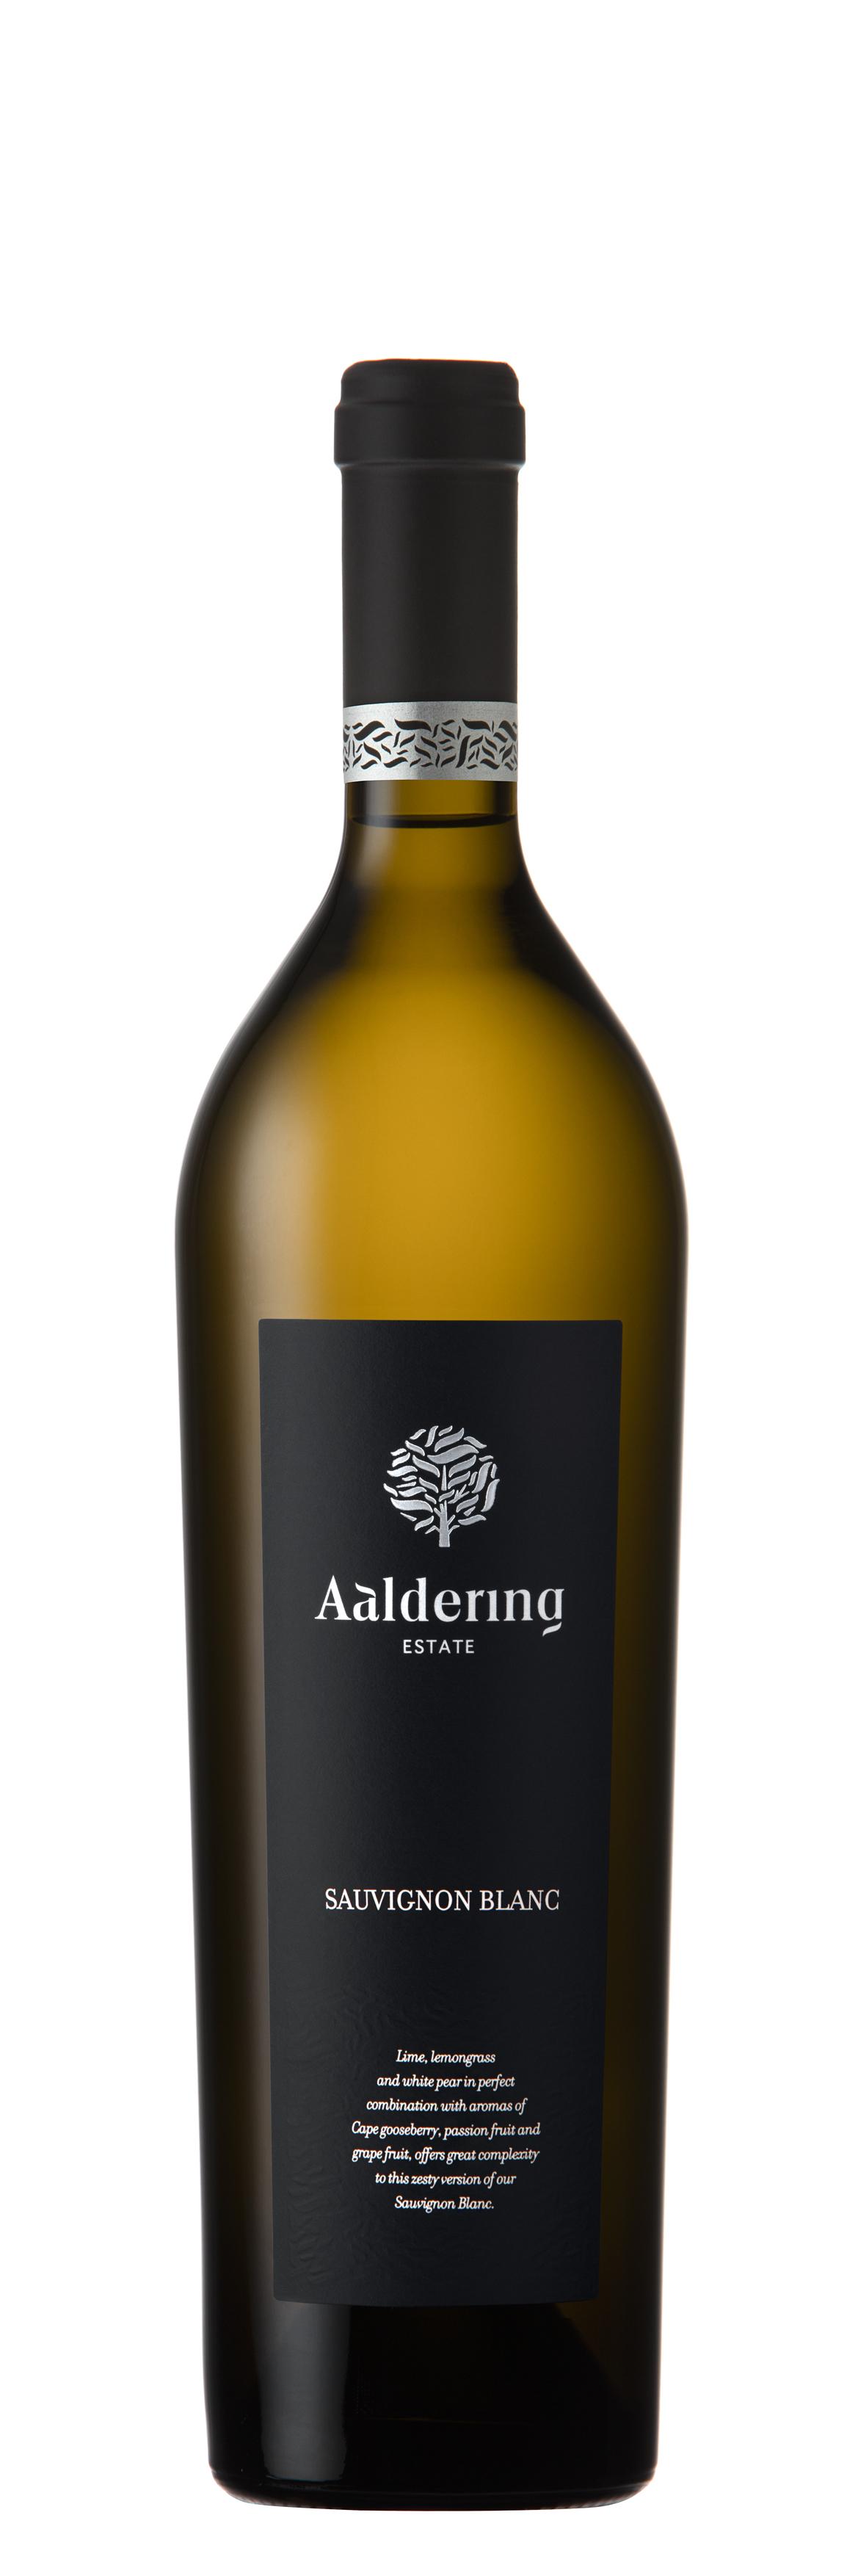 Aaldering Sauvignon Blanc 2019